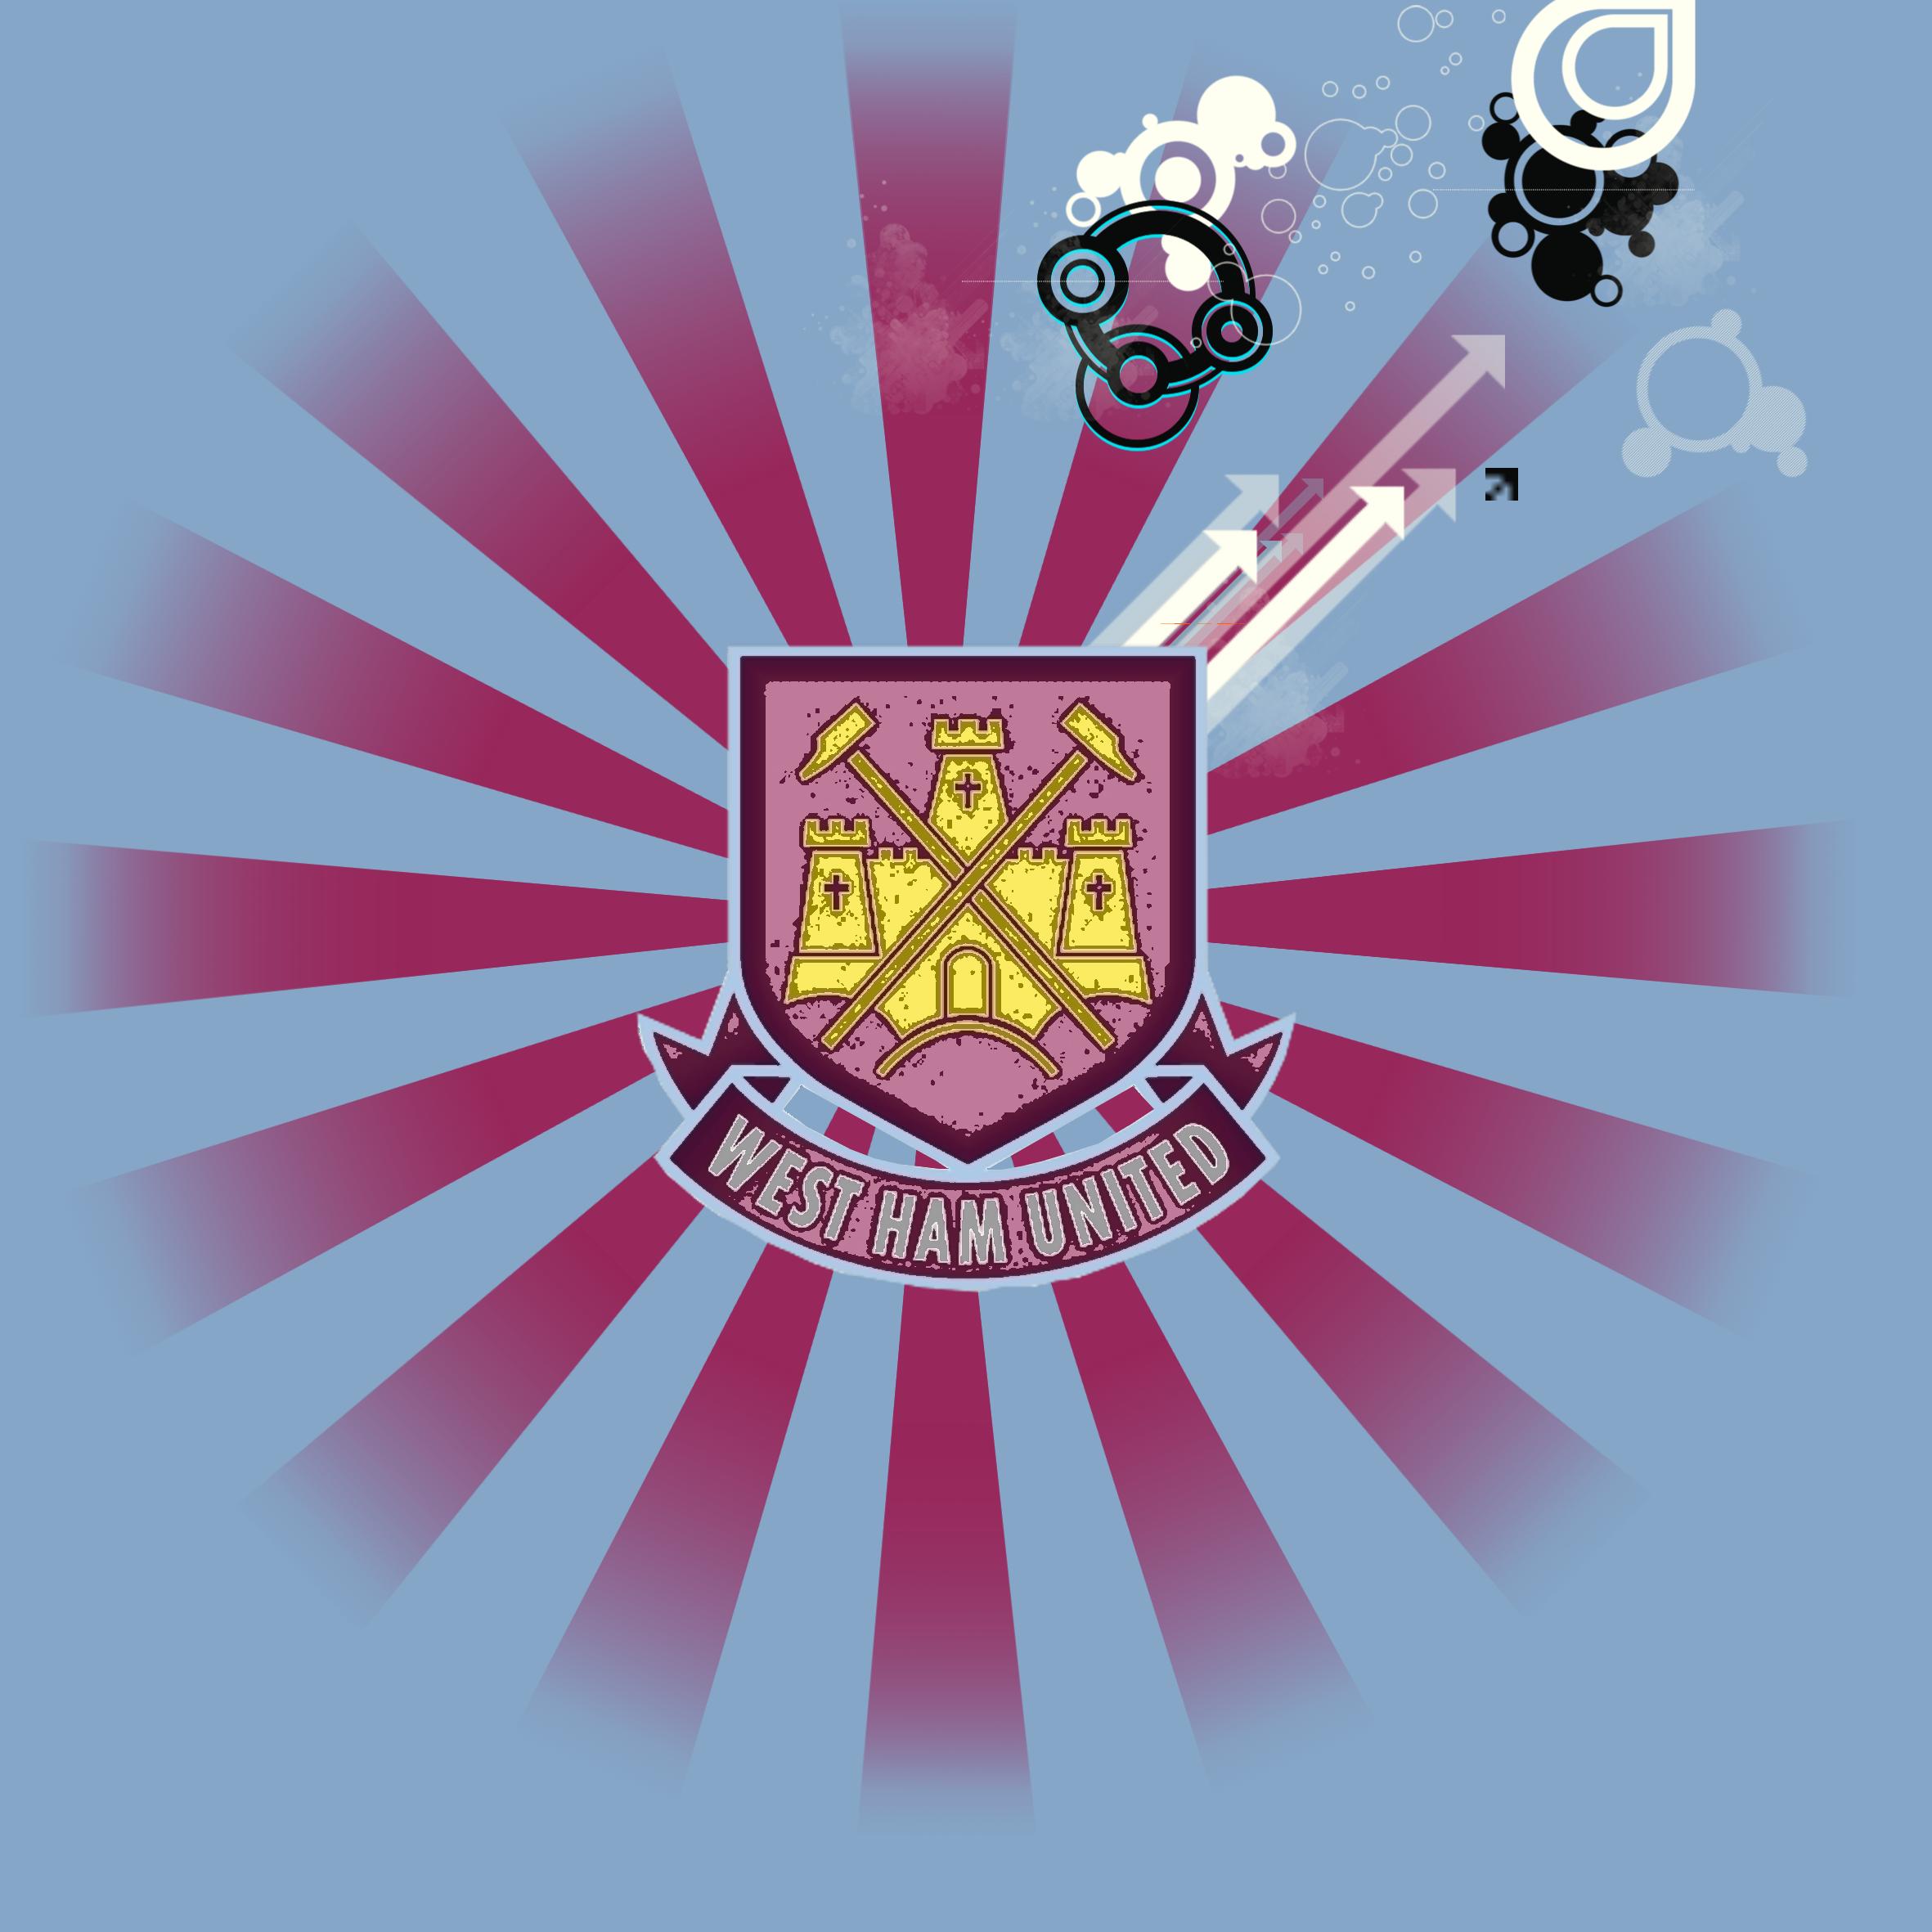 The Famous Football Club England West Ham United